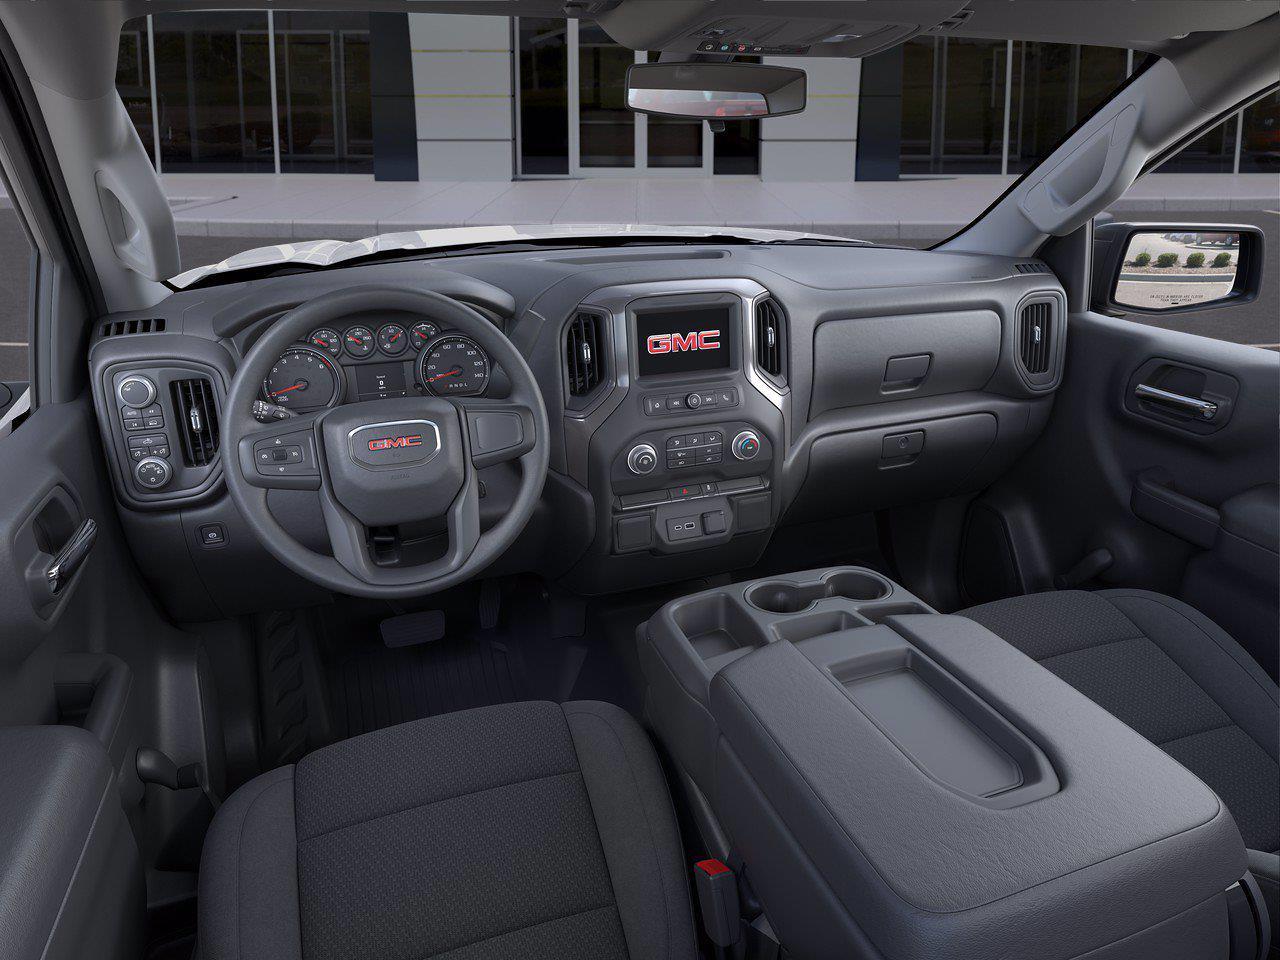 2021 GMC Sierra 1500 Regular Cab 4x4, Pickup #416065 - photo 12